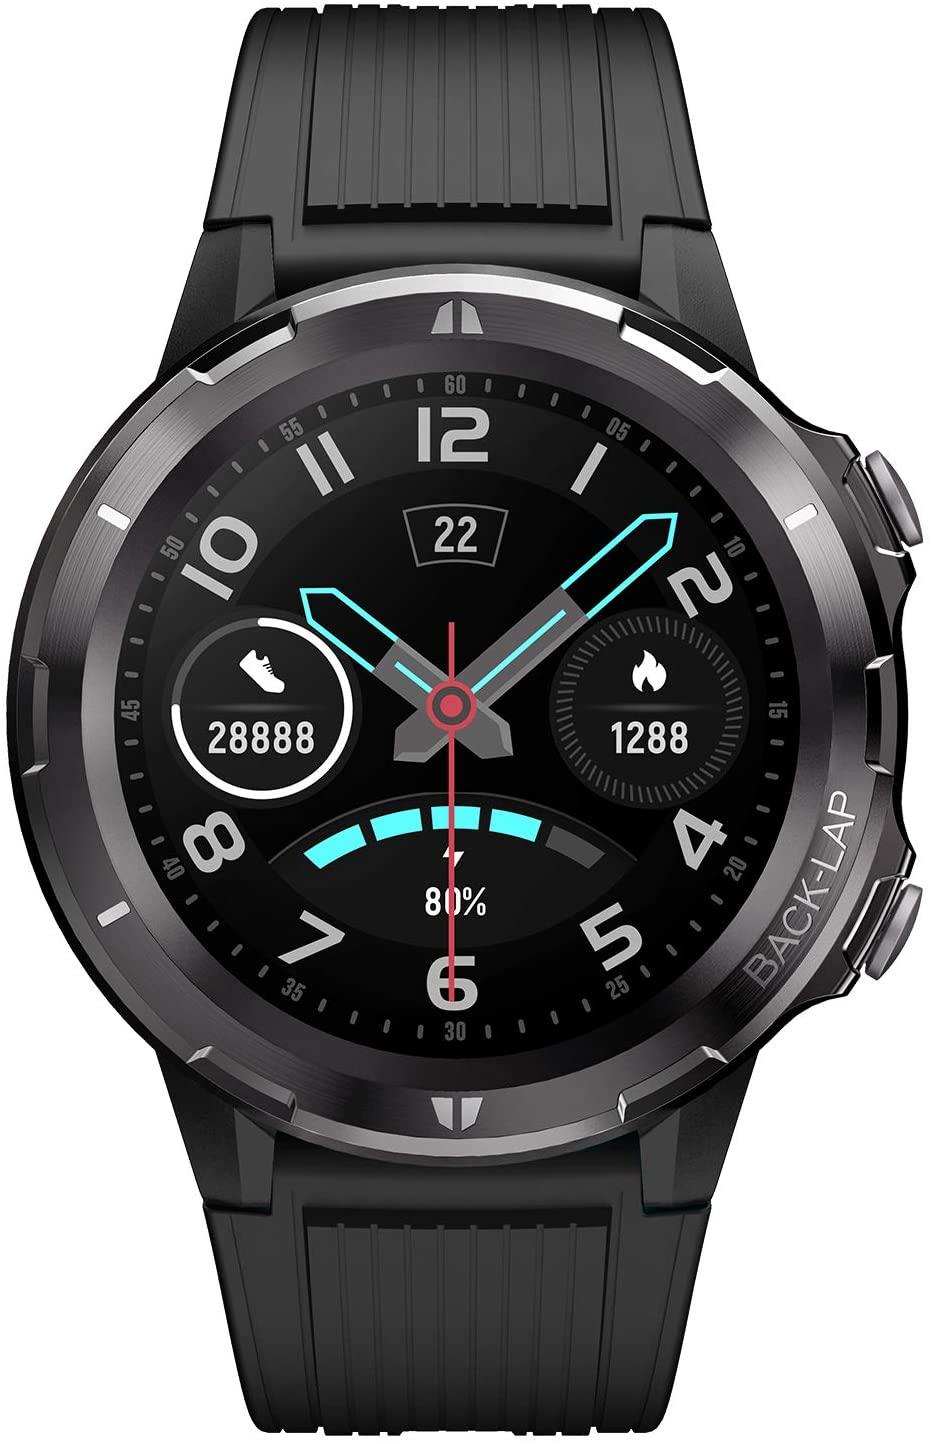 LETSCOM Smart Watch, Fitness Tracker with Heart Rate Monitor, IP68 Waterproof Smartwatch 1.3